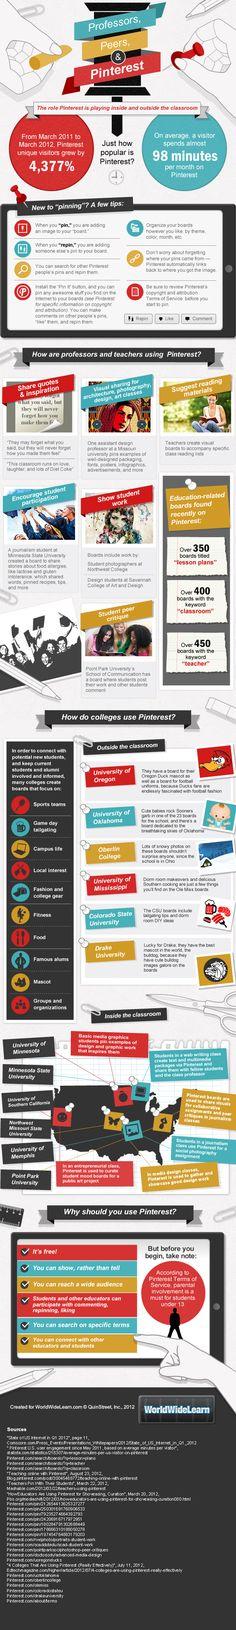 teachers guide to Pinterest